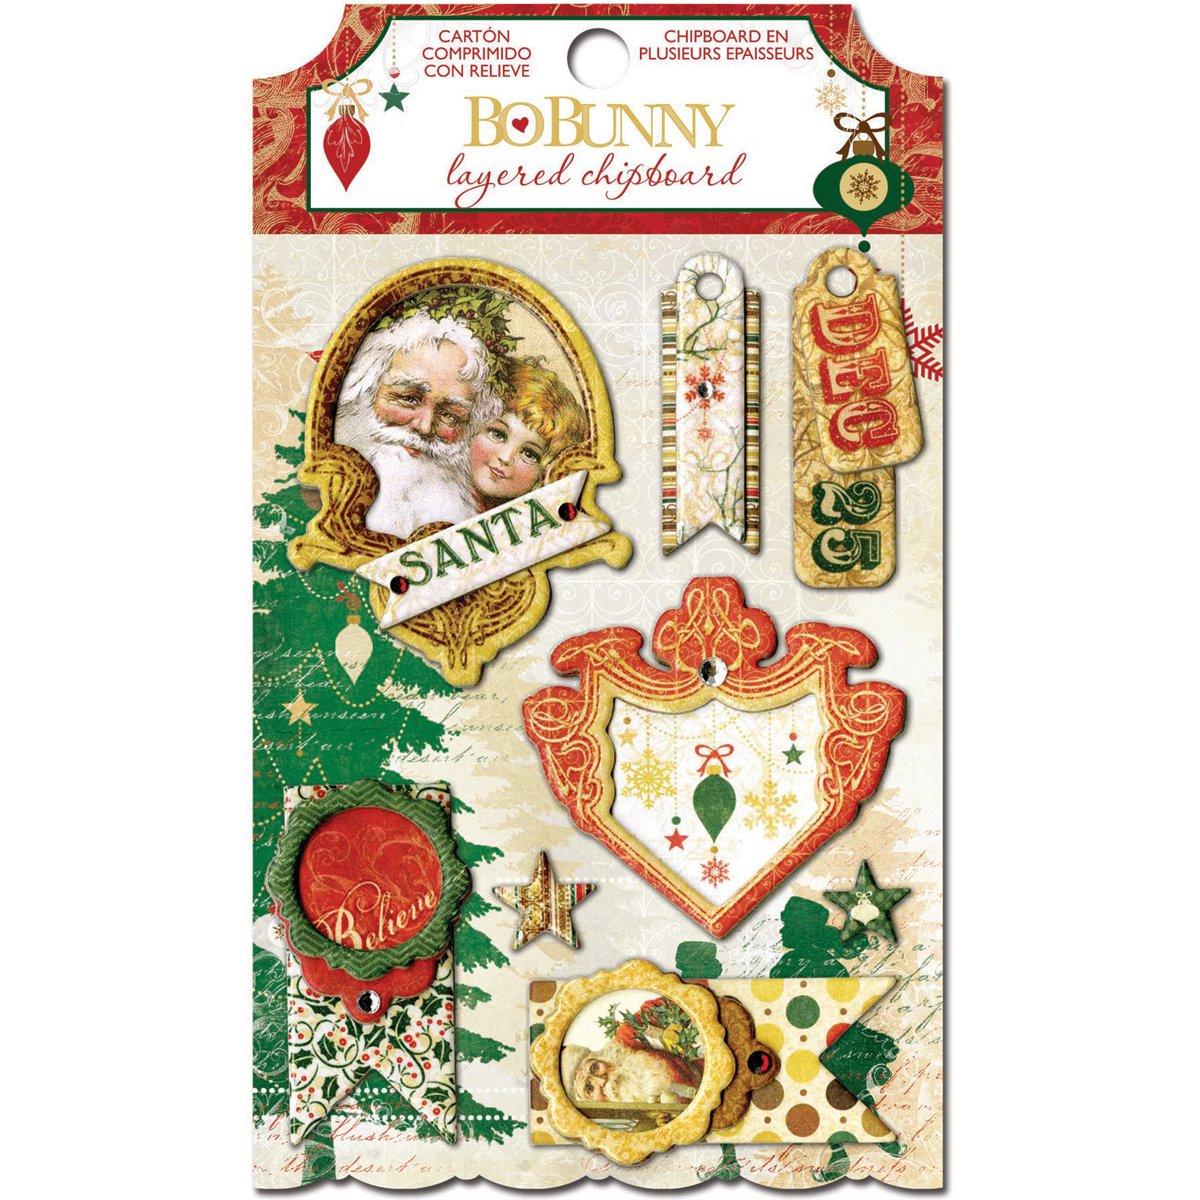 Bo Bunny Silver & Gold Self-Adhesive Layered Chipboard- BoBunny Press BB15109015